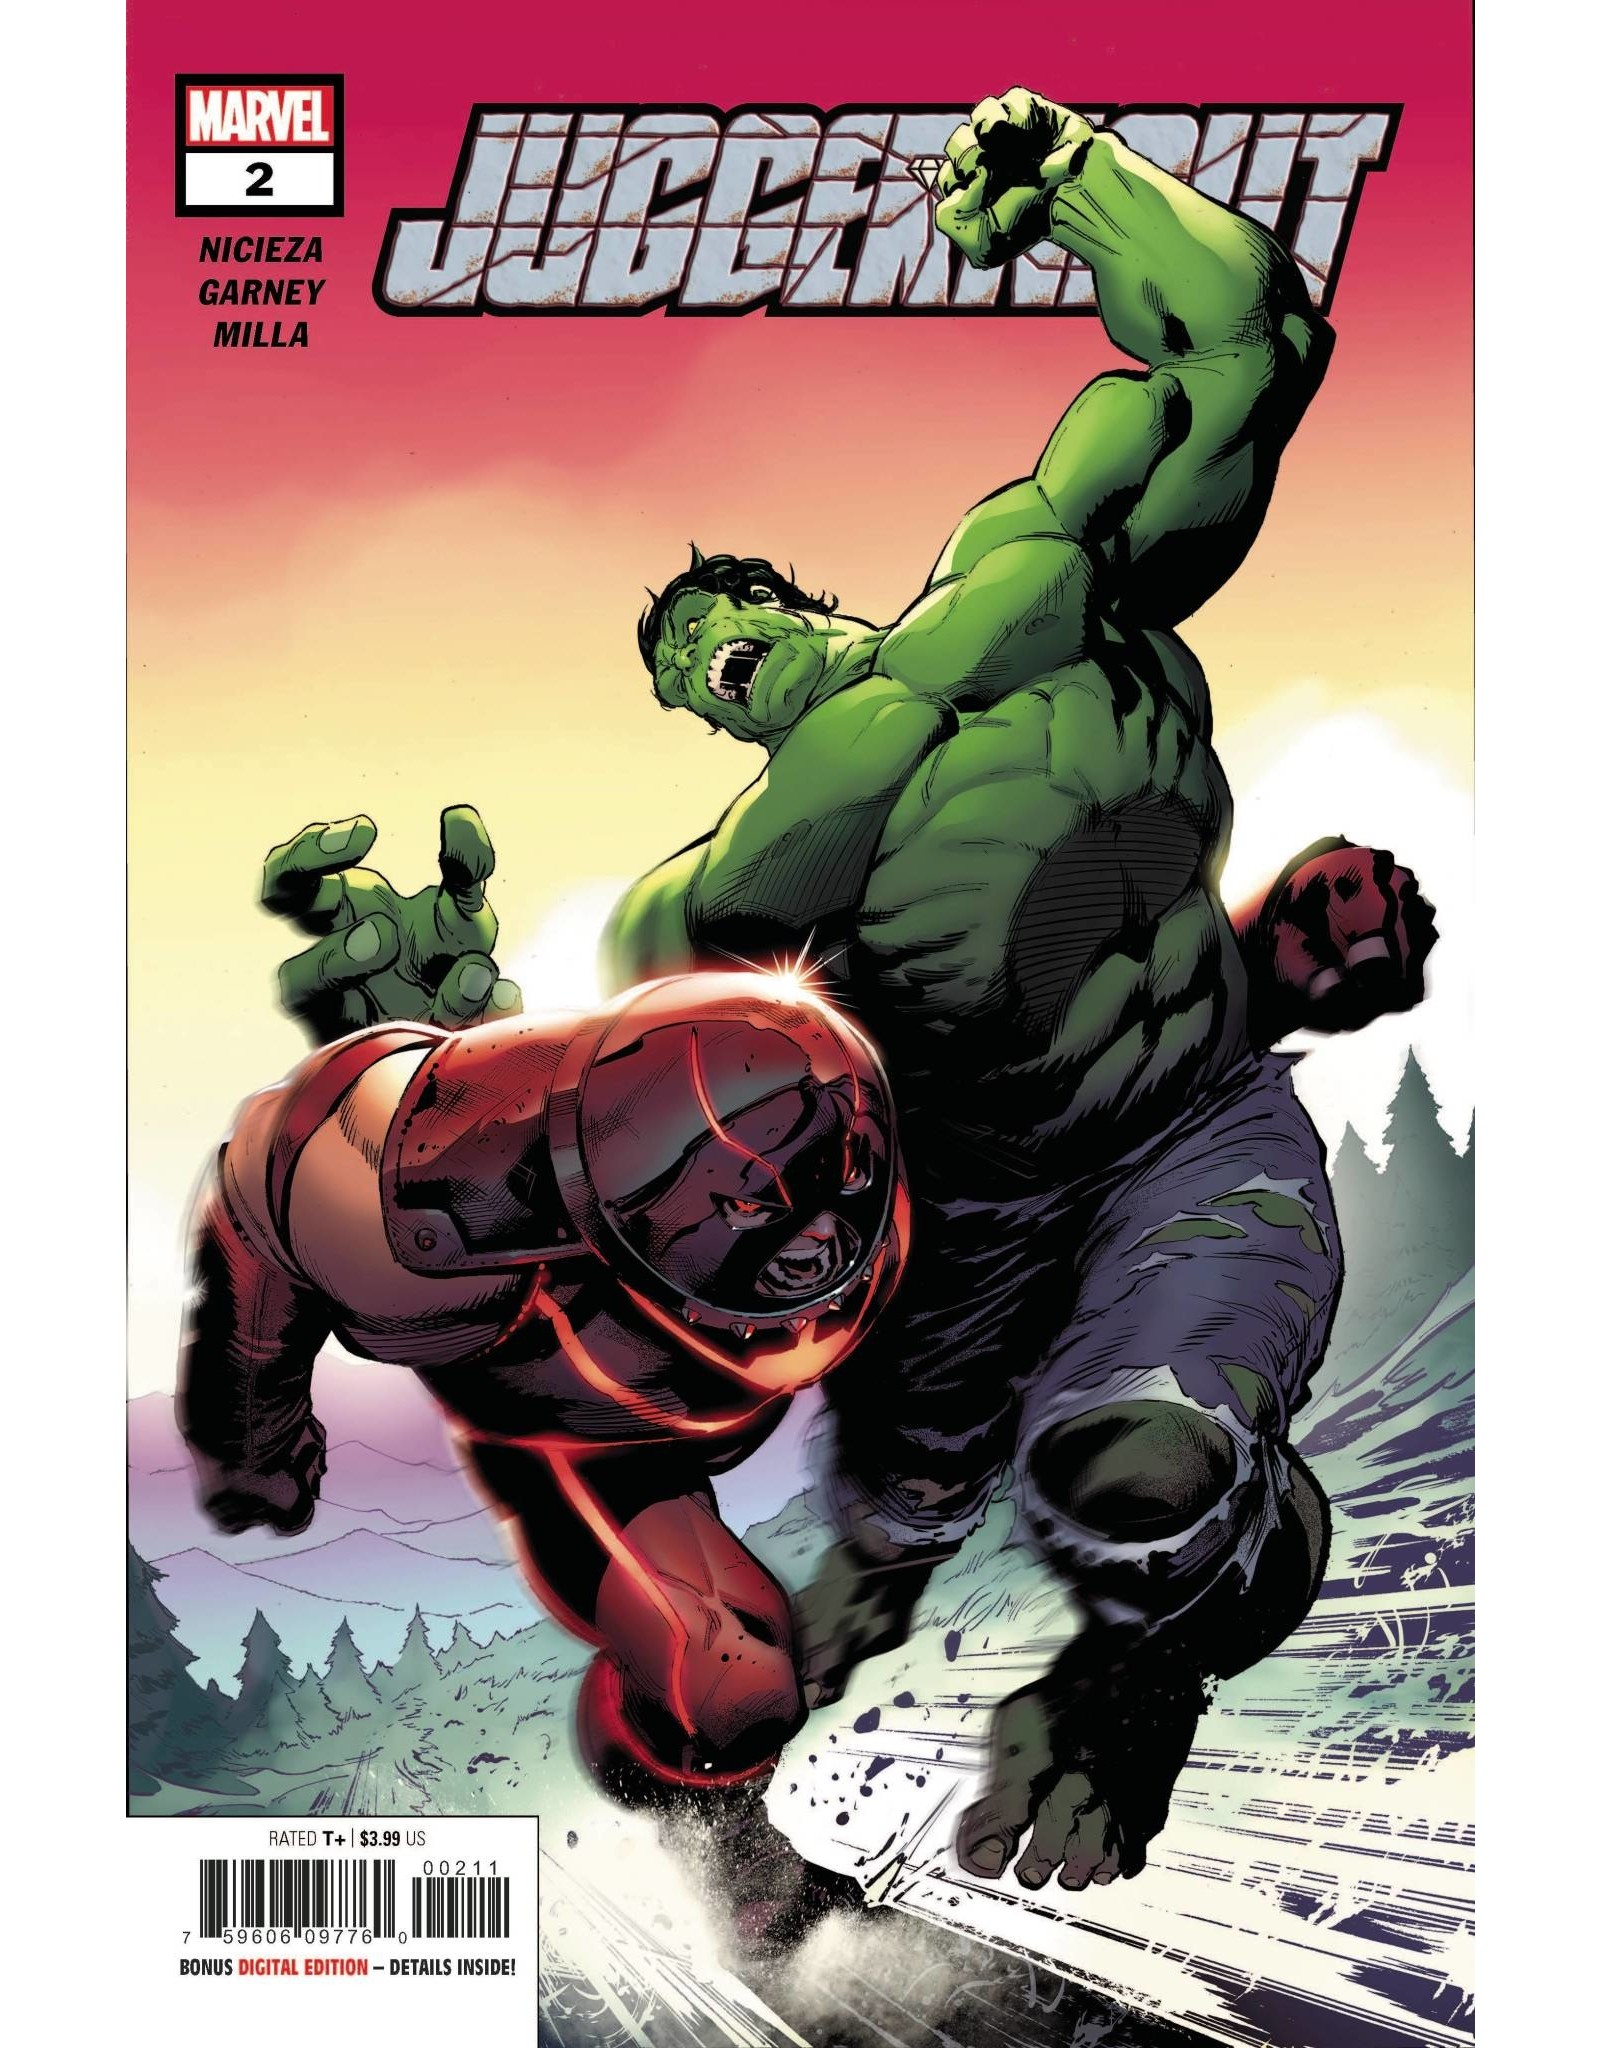 Marvel Comics JUGGERNAUT #2 (OF 5) DX